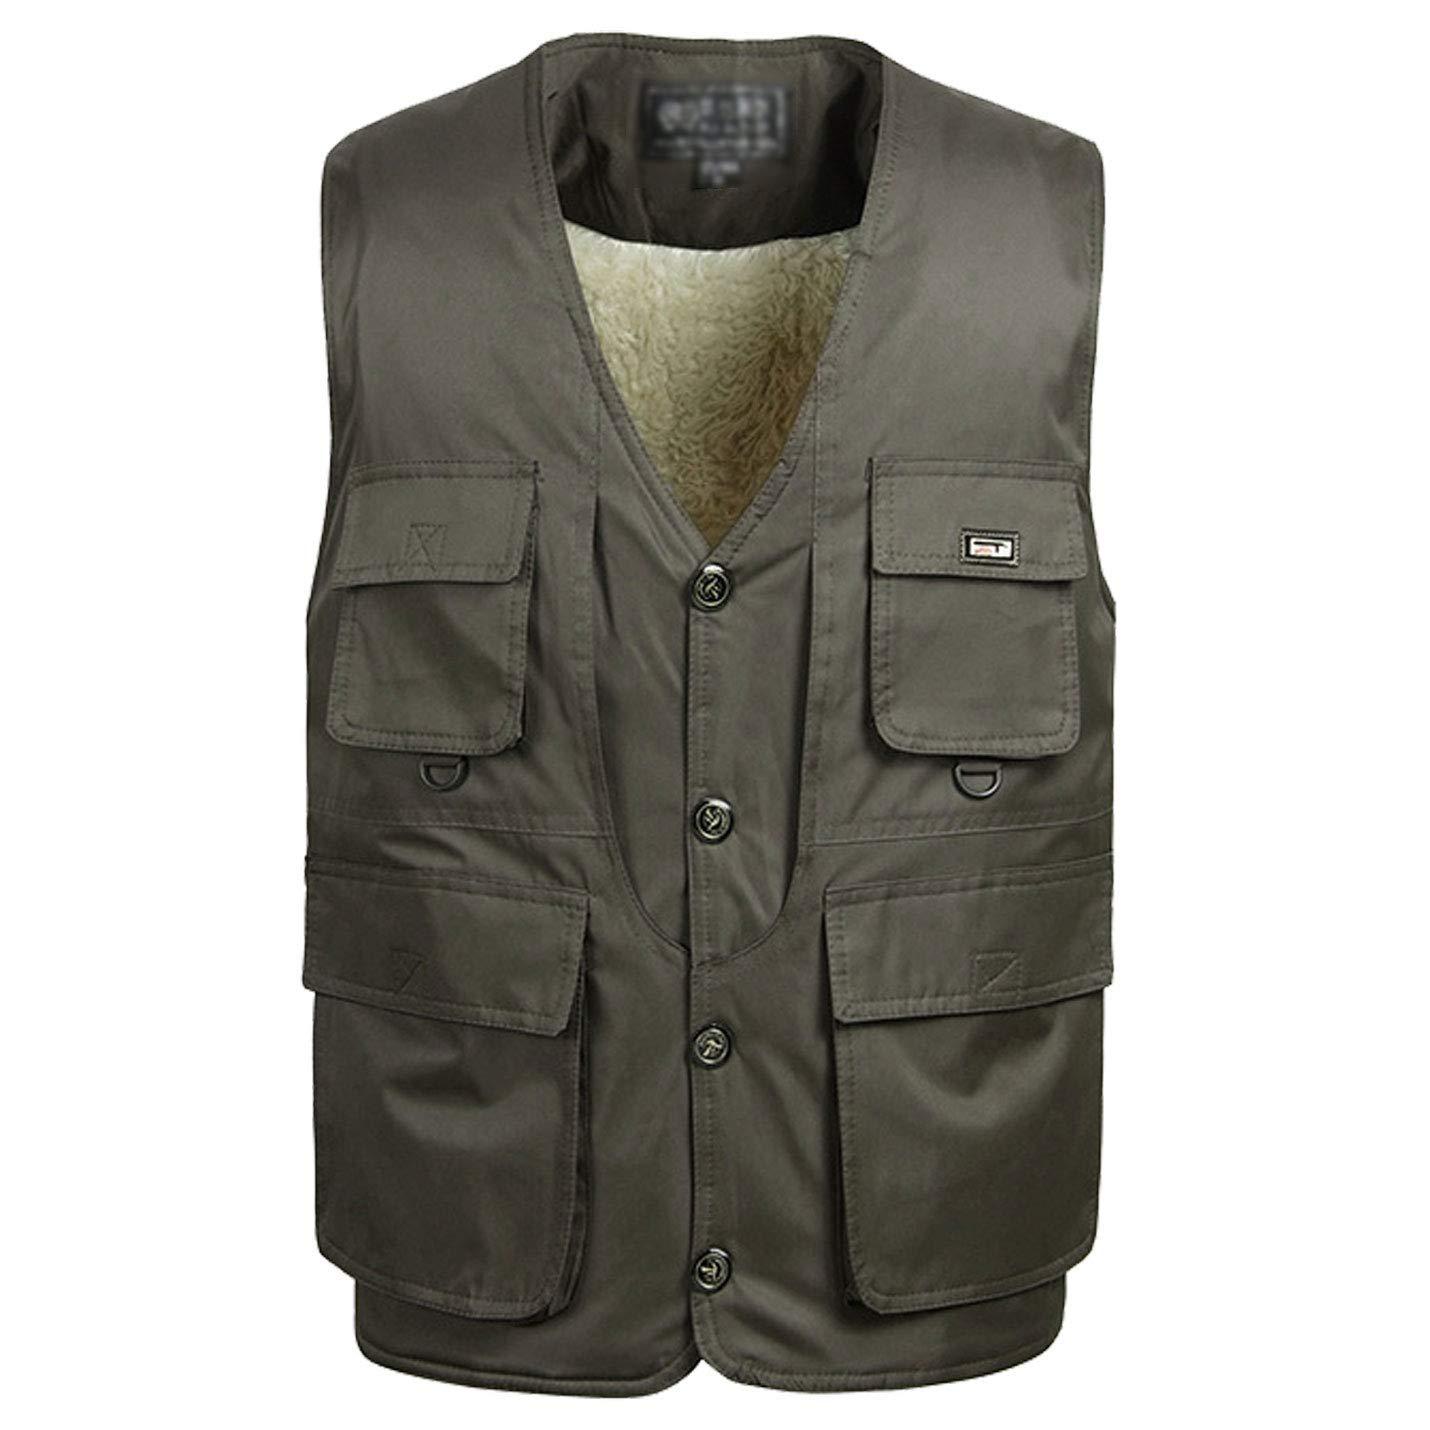 Flygo Men's Casual Warm Fleece Lined Multi Pockets Outdoor Work Fishing Travels Vest